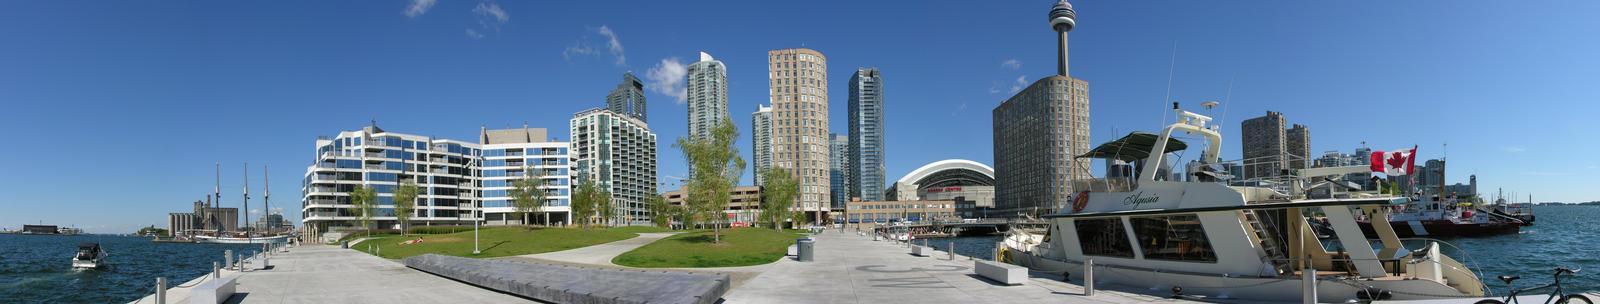 Toronto Lakefront